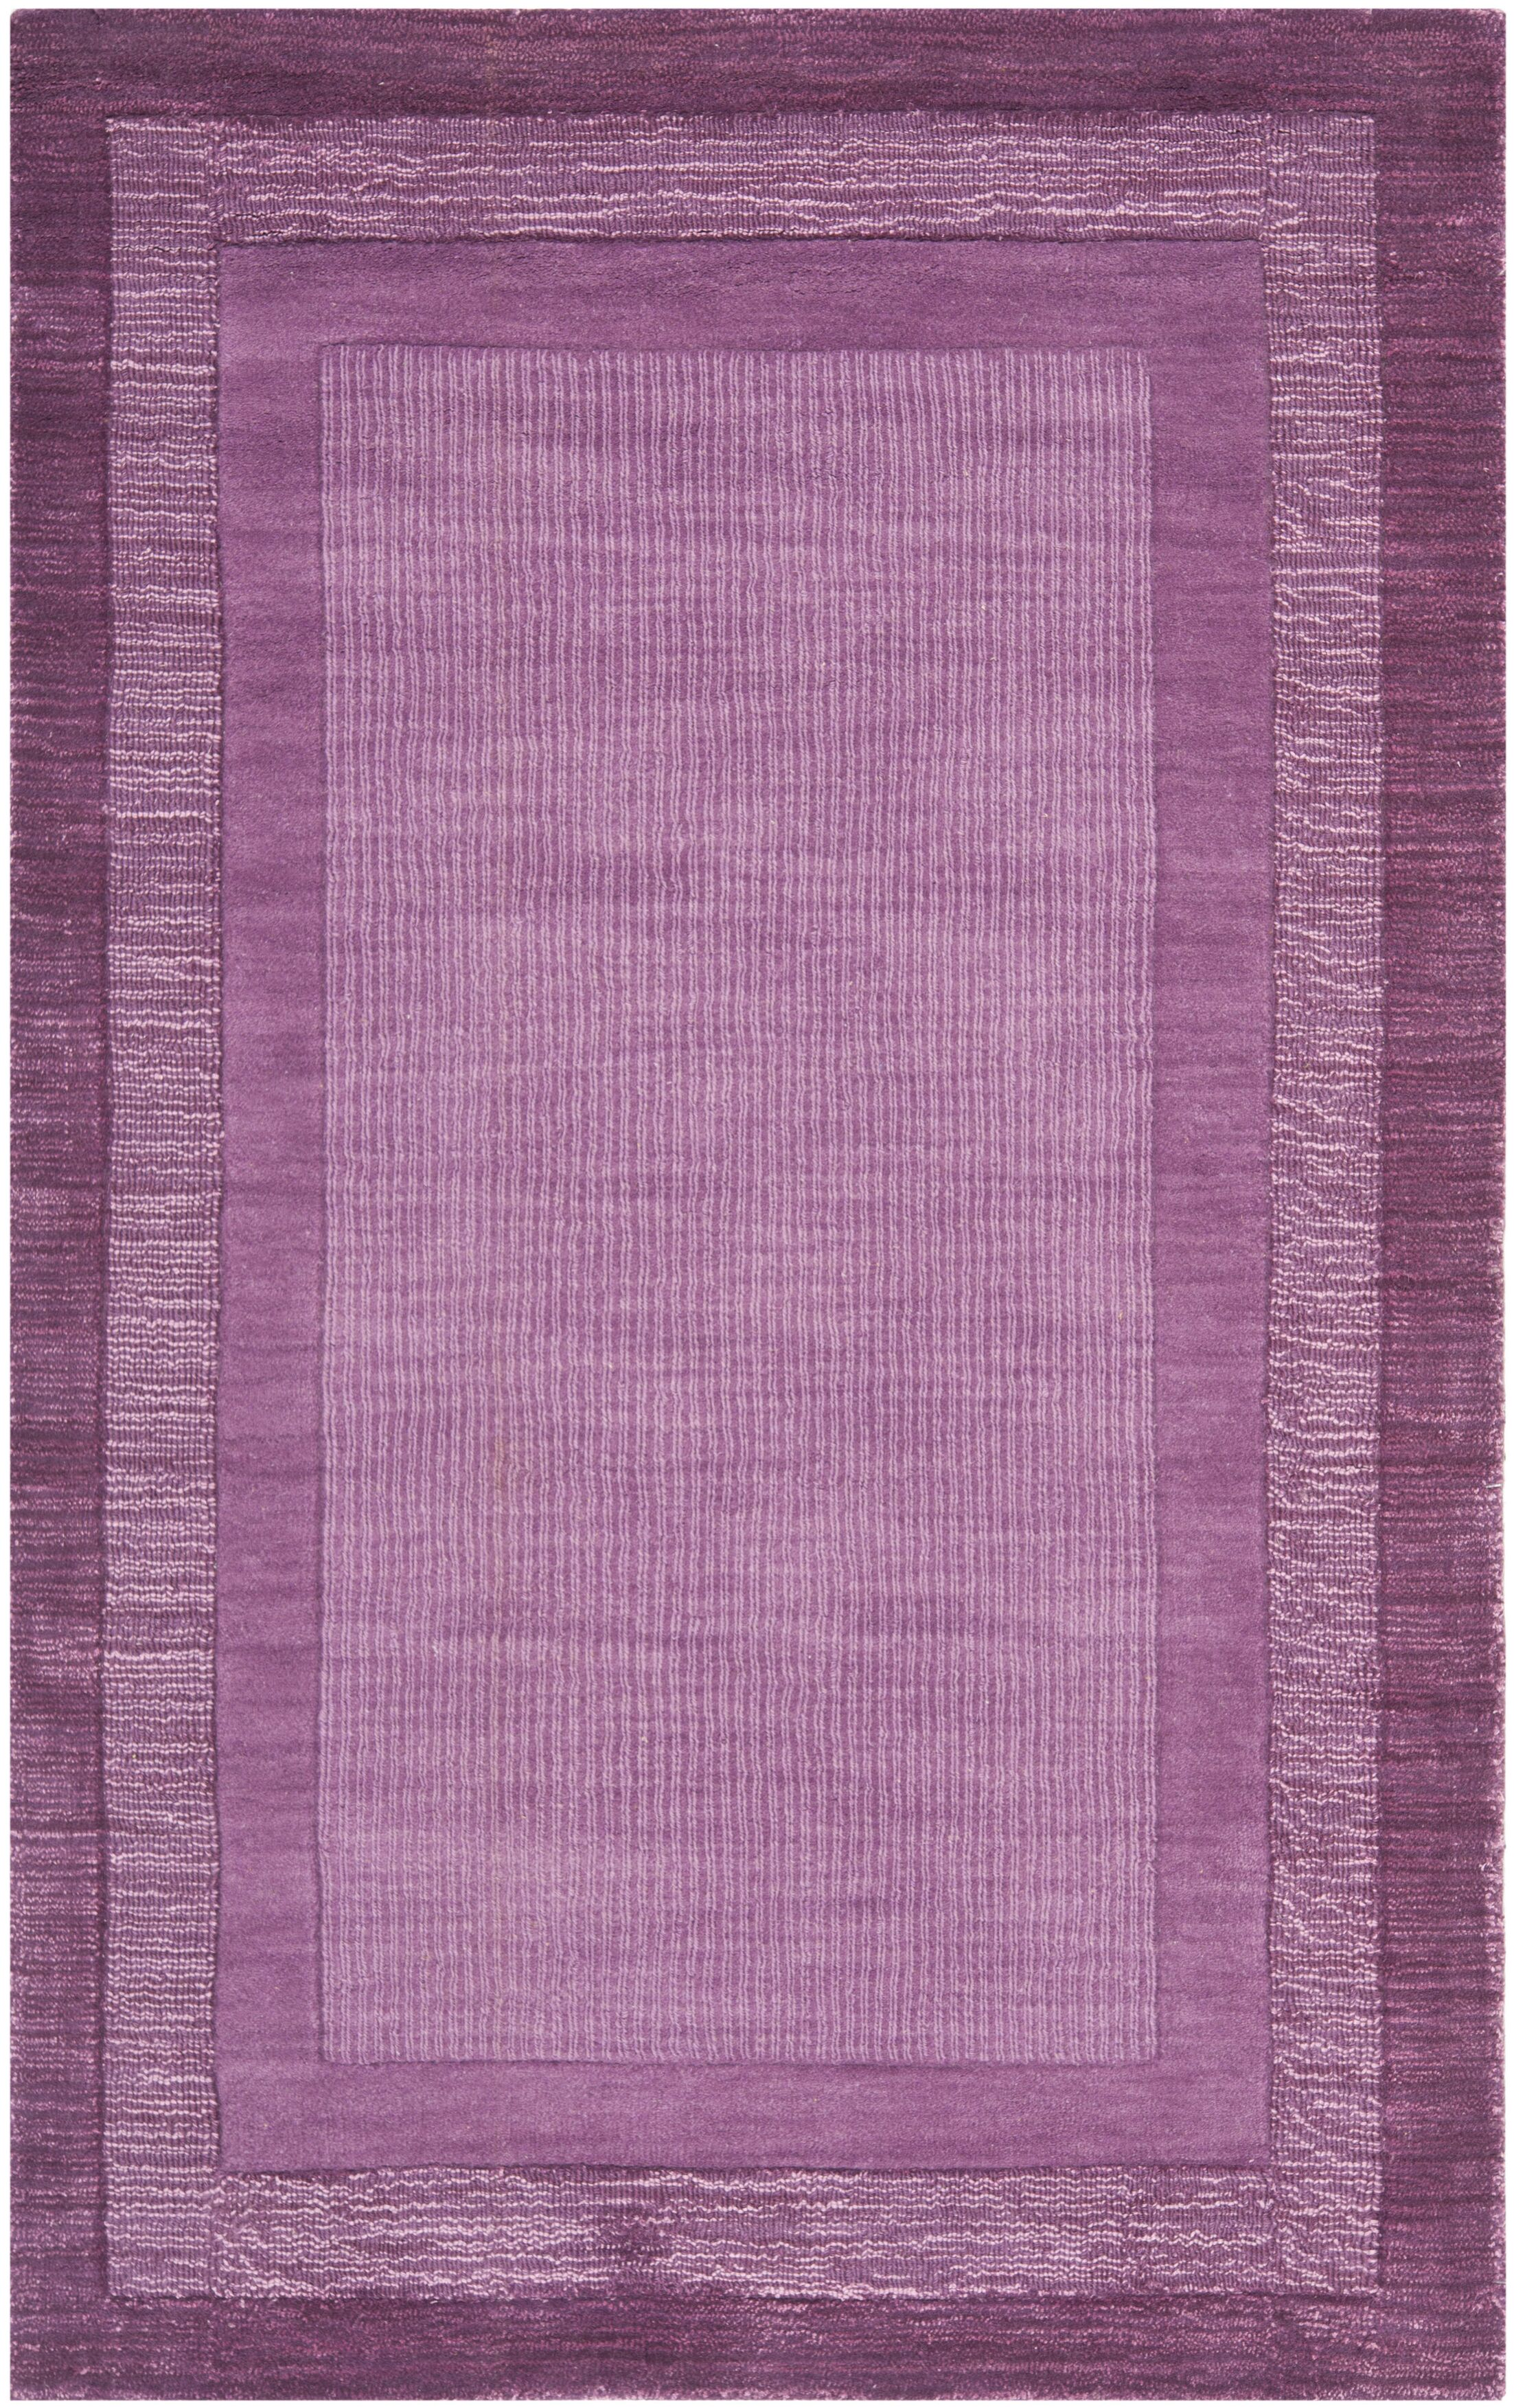 Scanlan Purple Area Rug Rug Size: Rectangle 4' x 6'